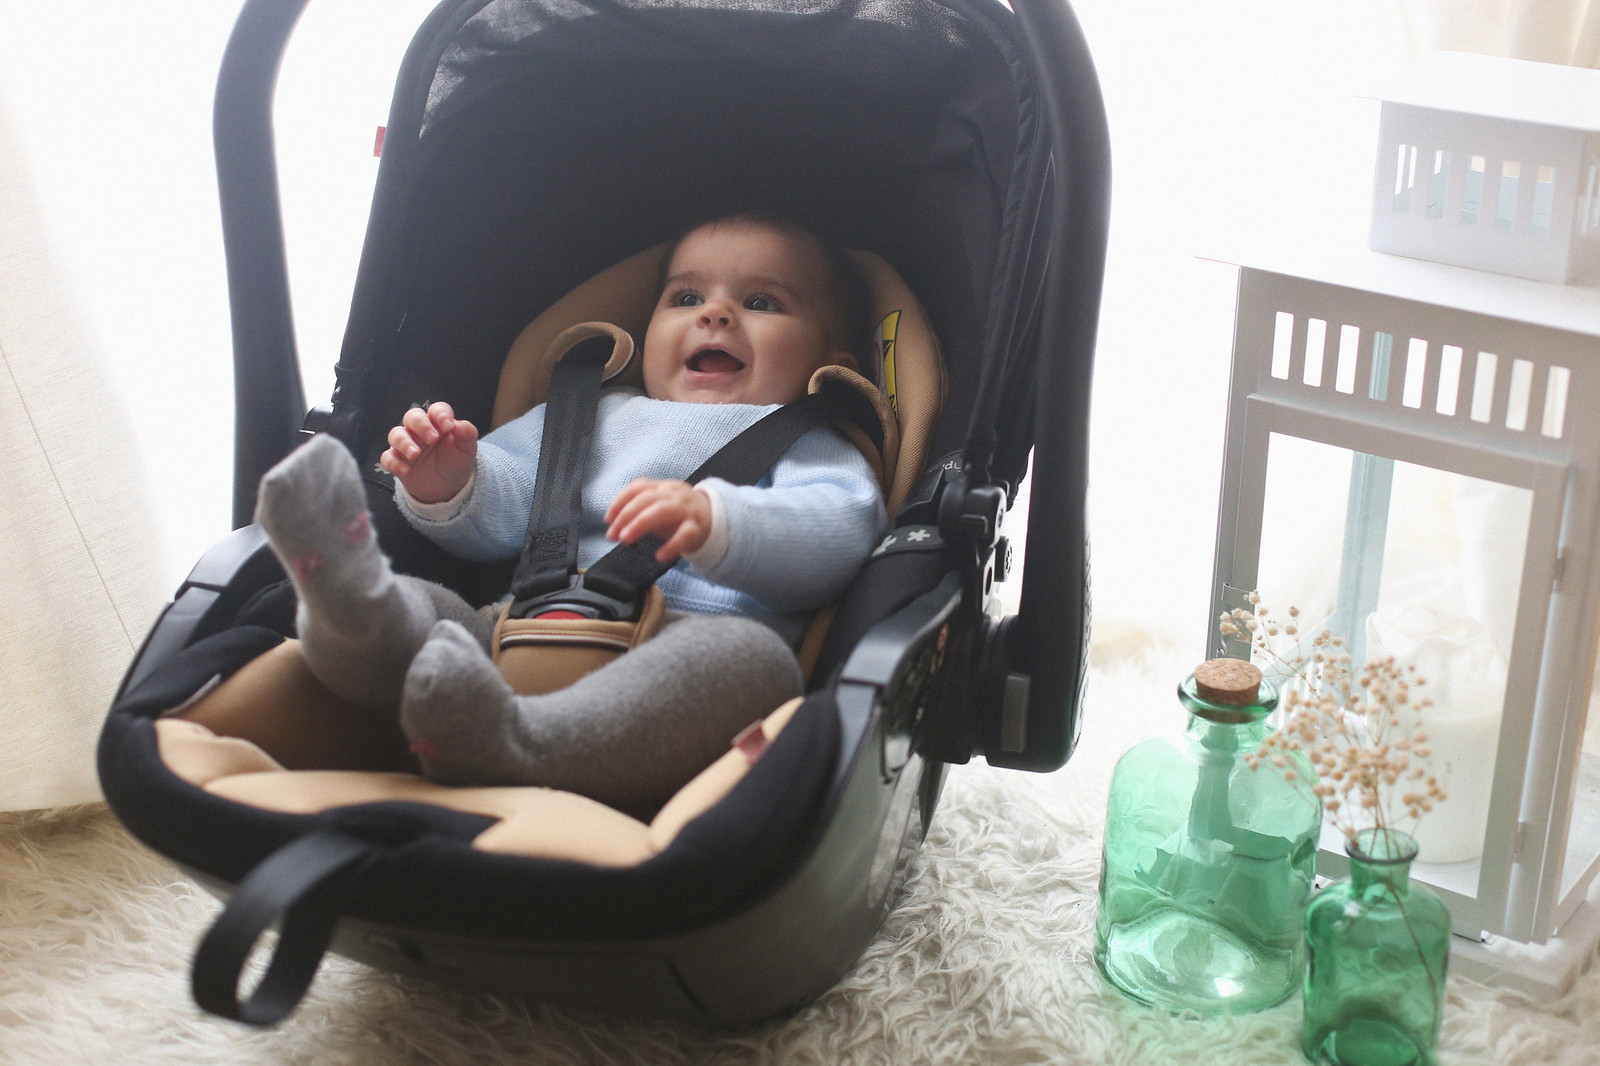 jessie chanes maternity - 9